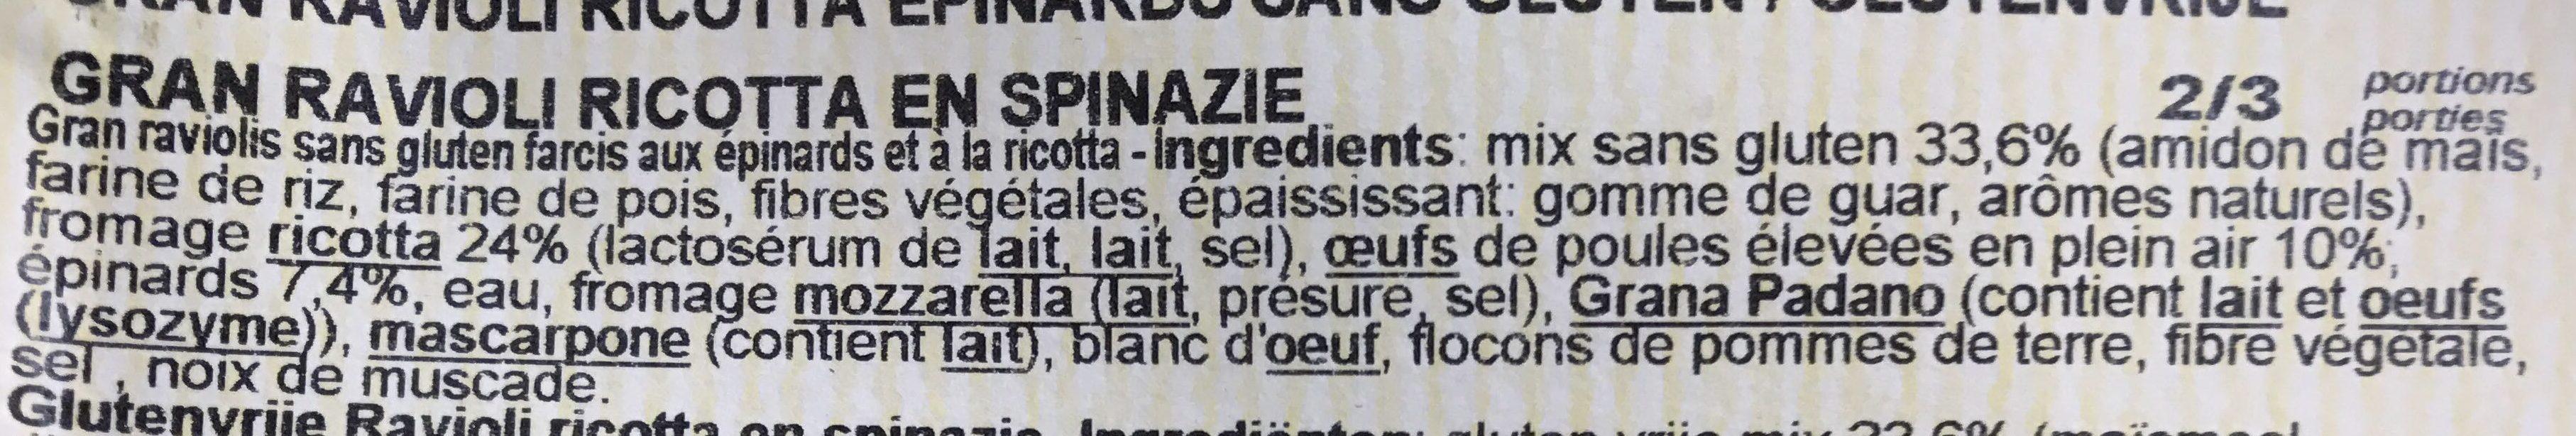 Ravioli ricotta e spinaci gluten free - Ingrediënten - fr